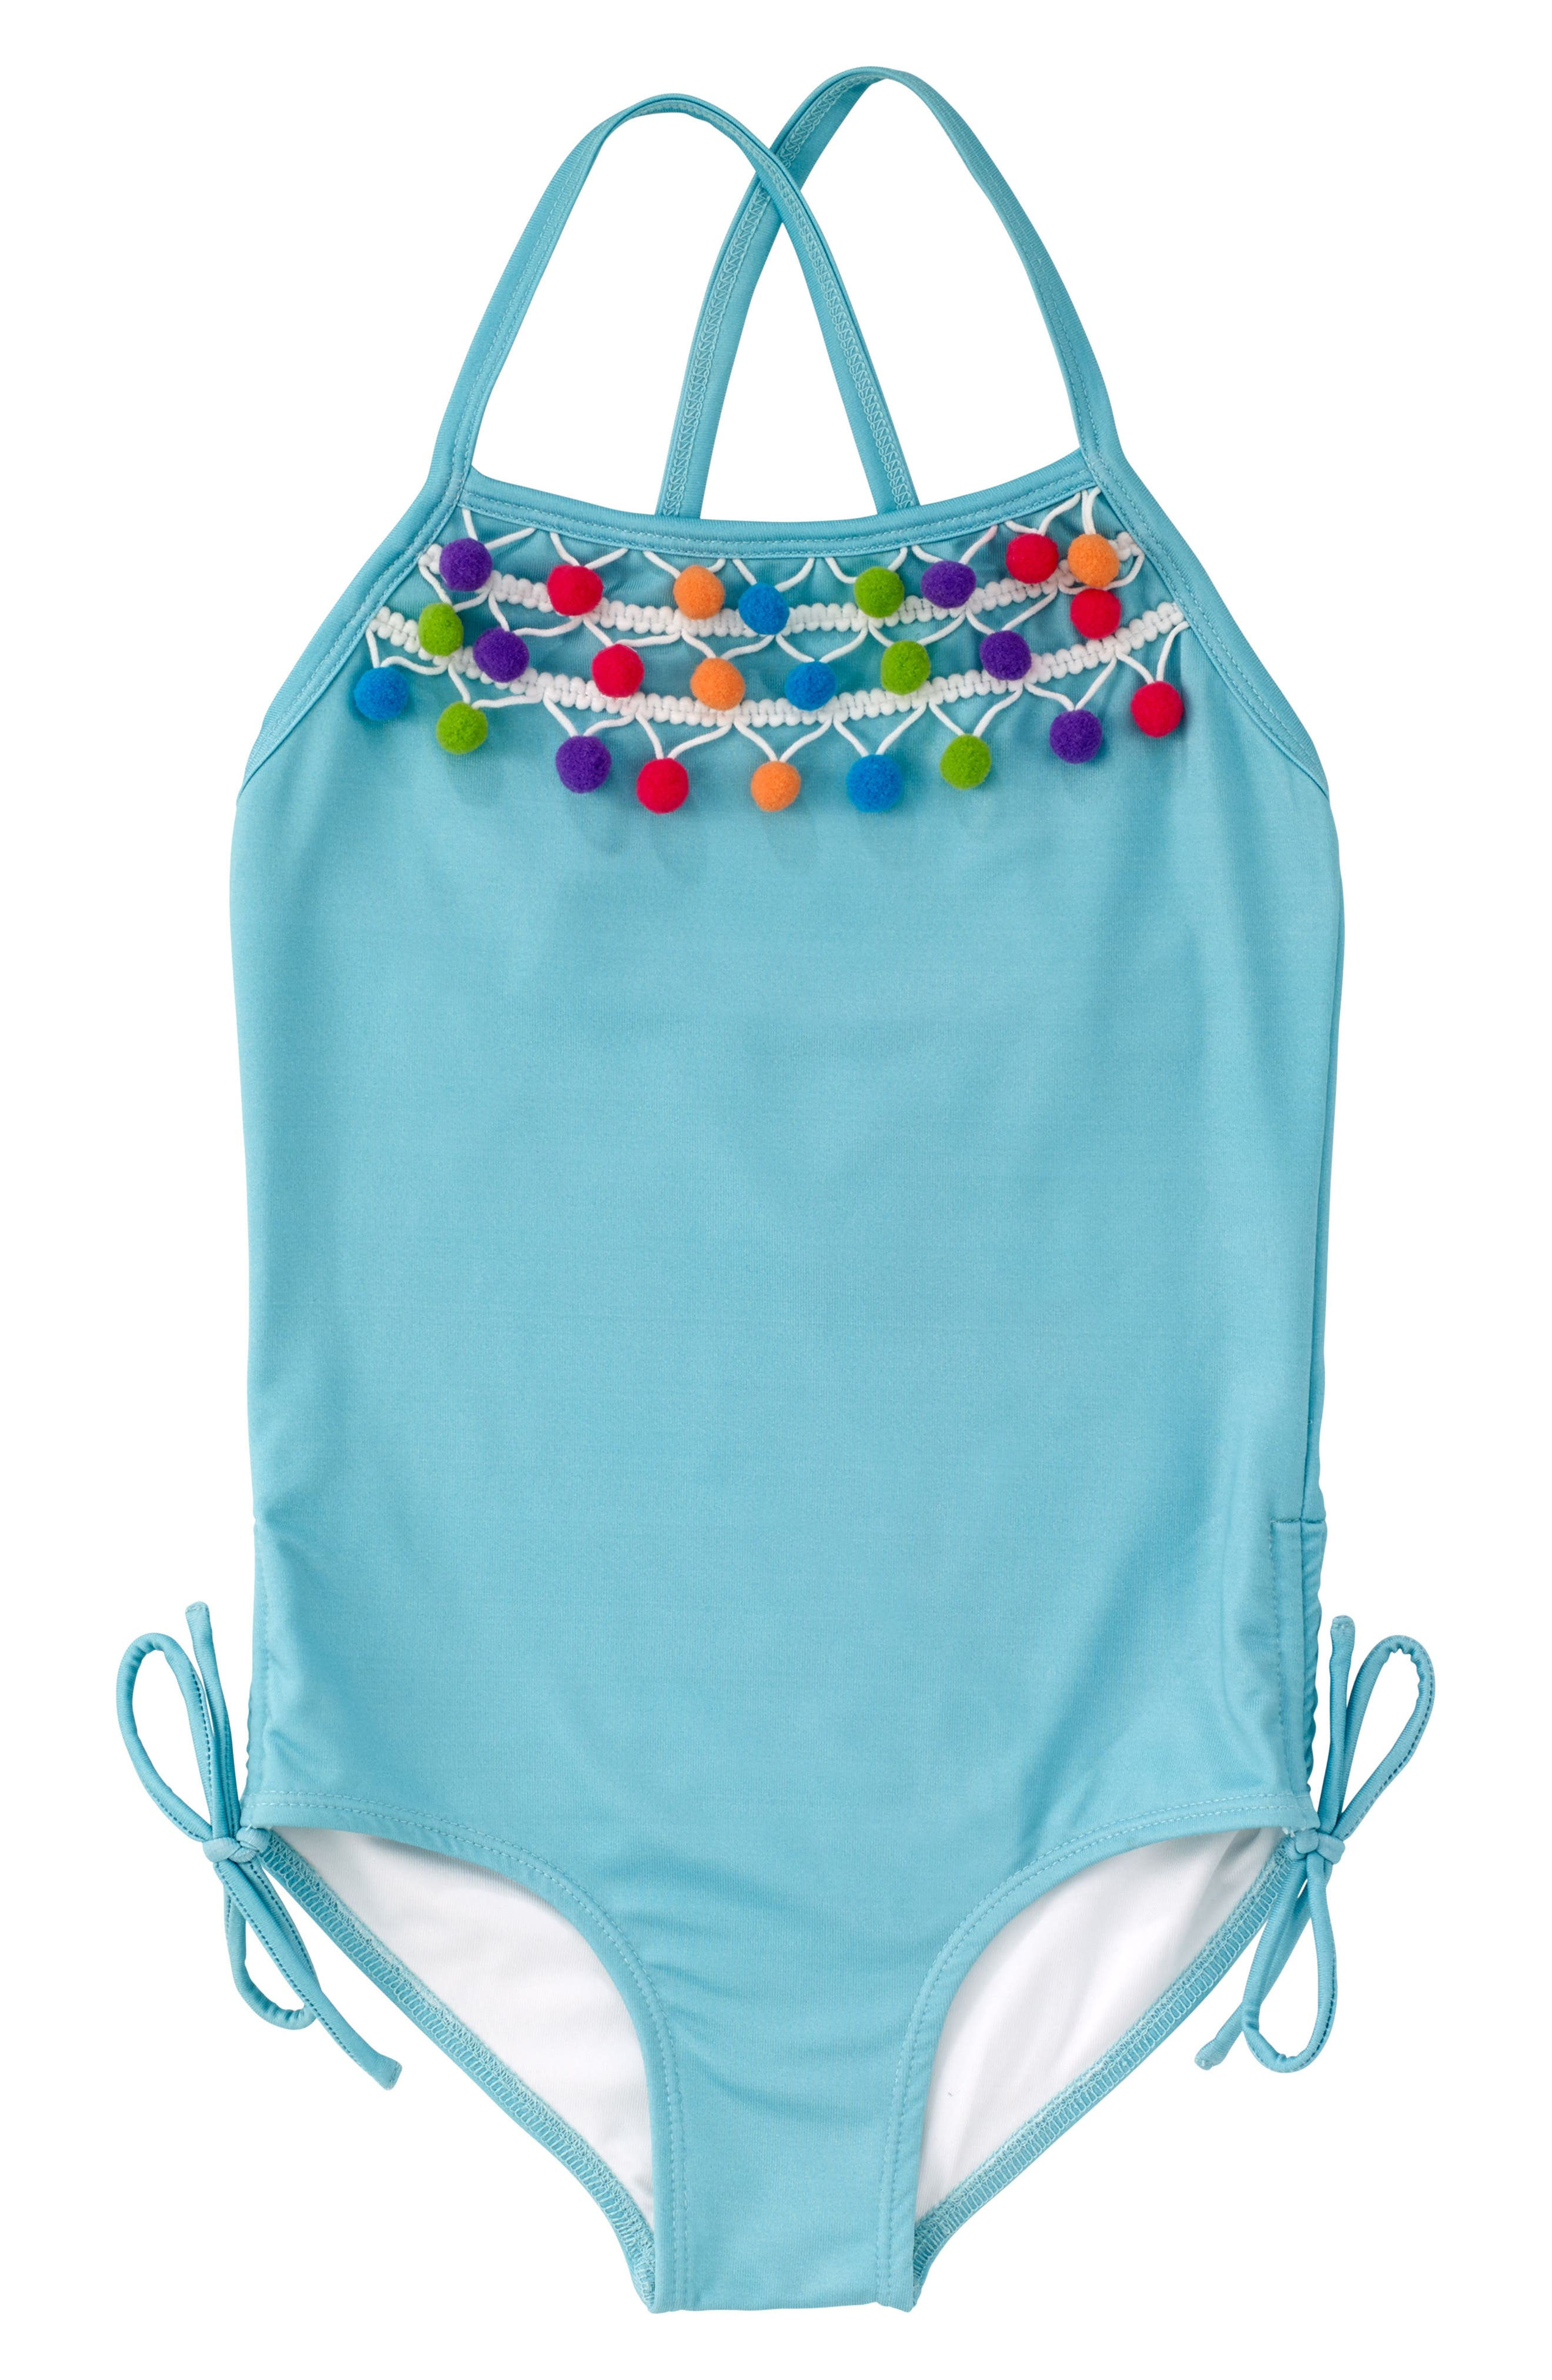 Main Image - Masala Baby Pompom One-Piece Swimsuit (Toddler Girls)